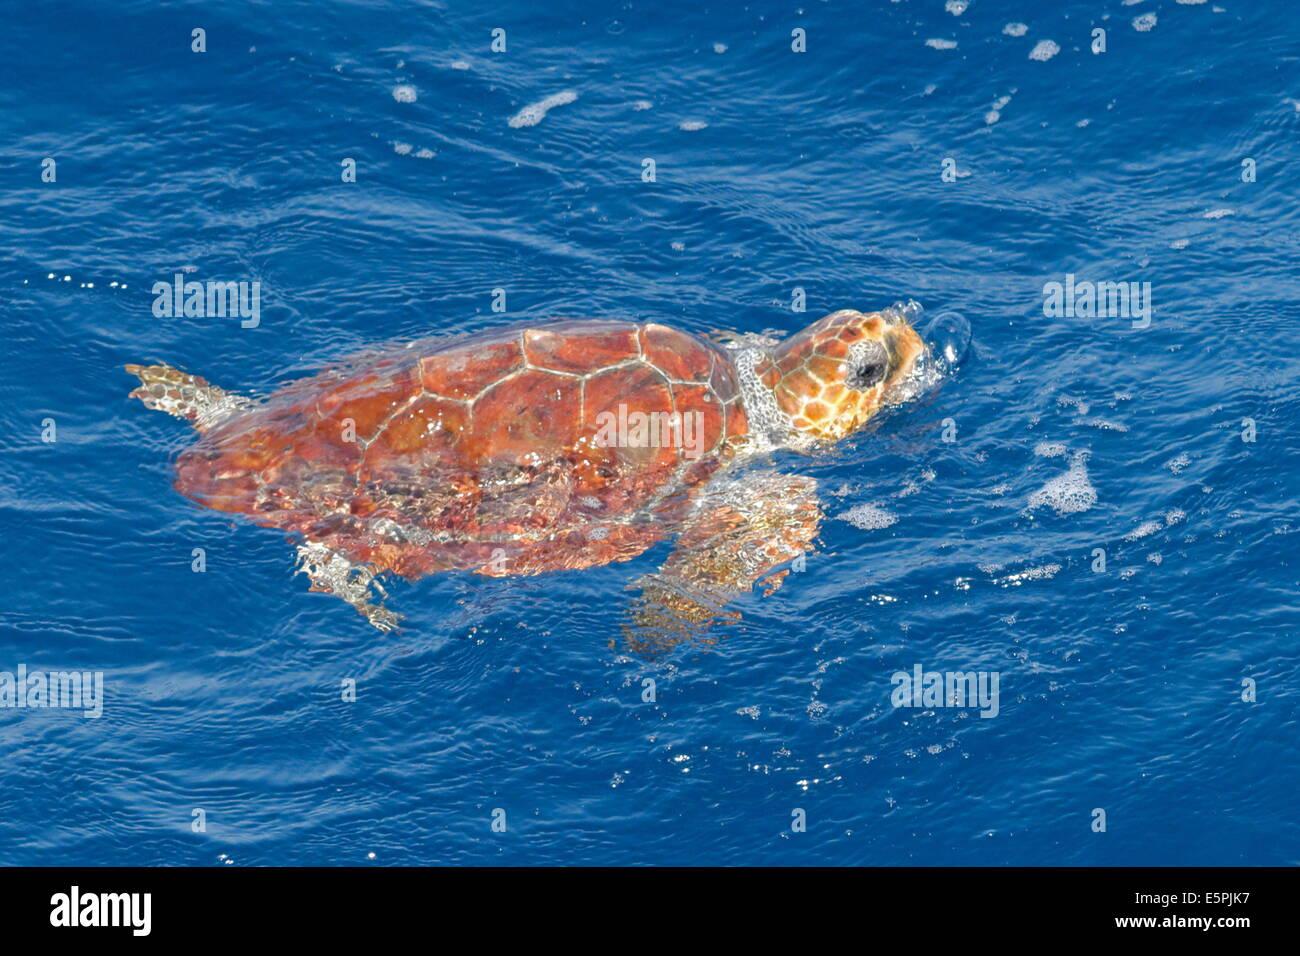 Juvenile loggerhead turtle (Caretta caretta), oceanic stage, breathing at the surface, Northeast Atlantic, offshore Morocco Stock Photo